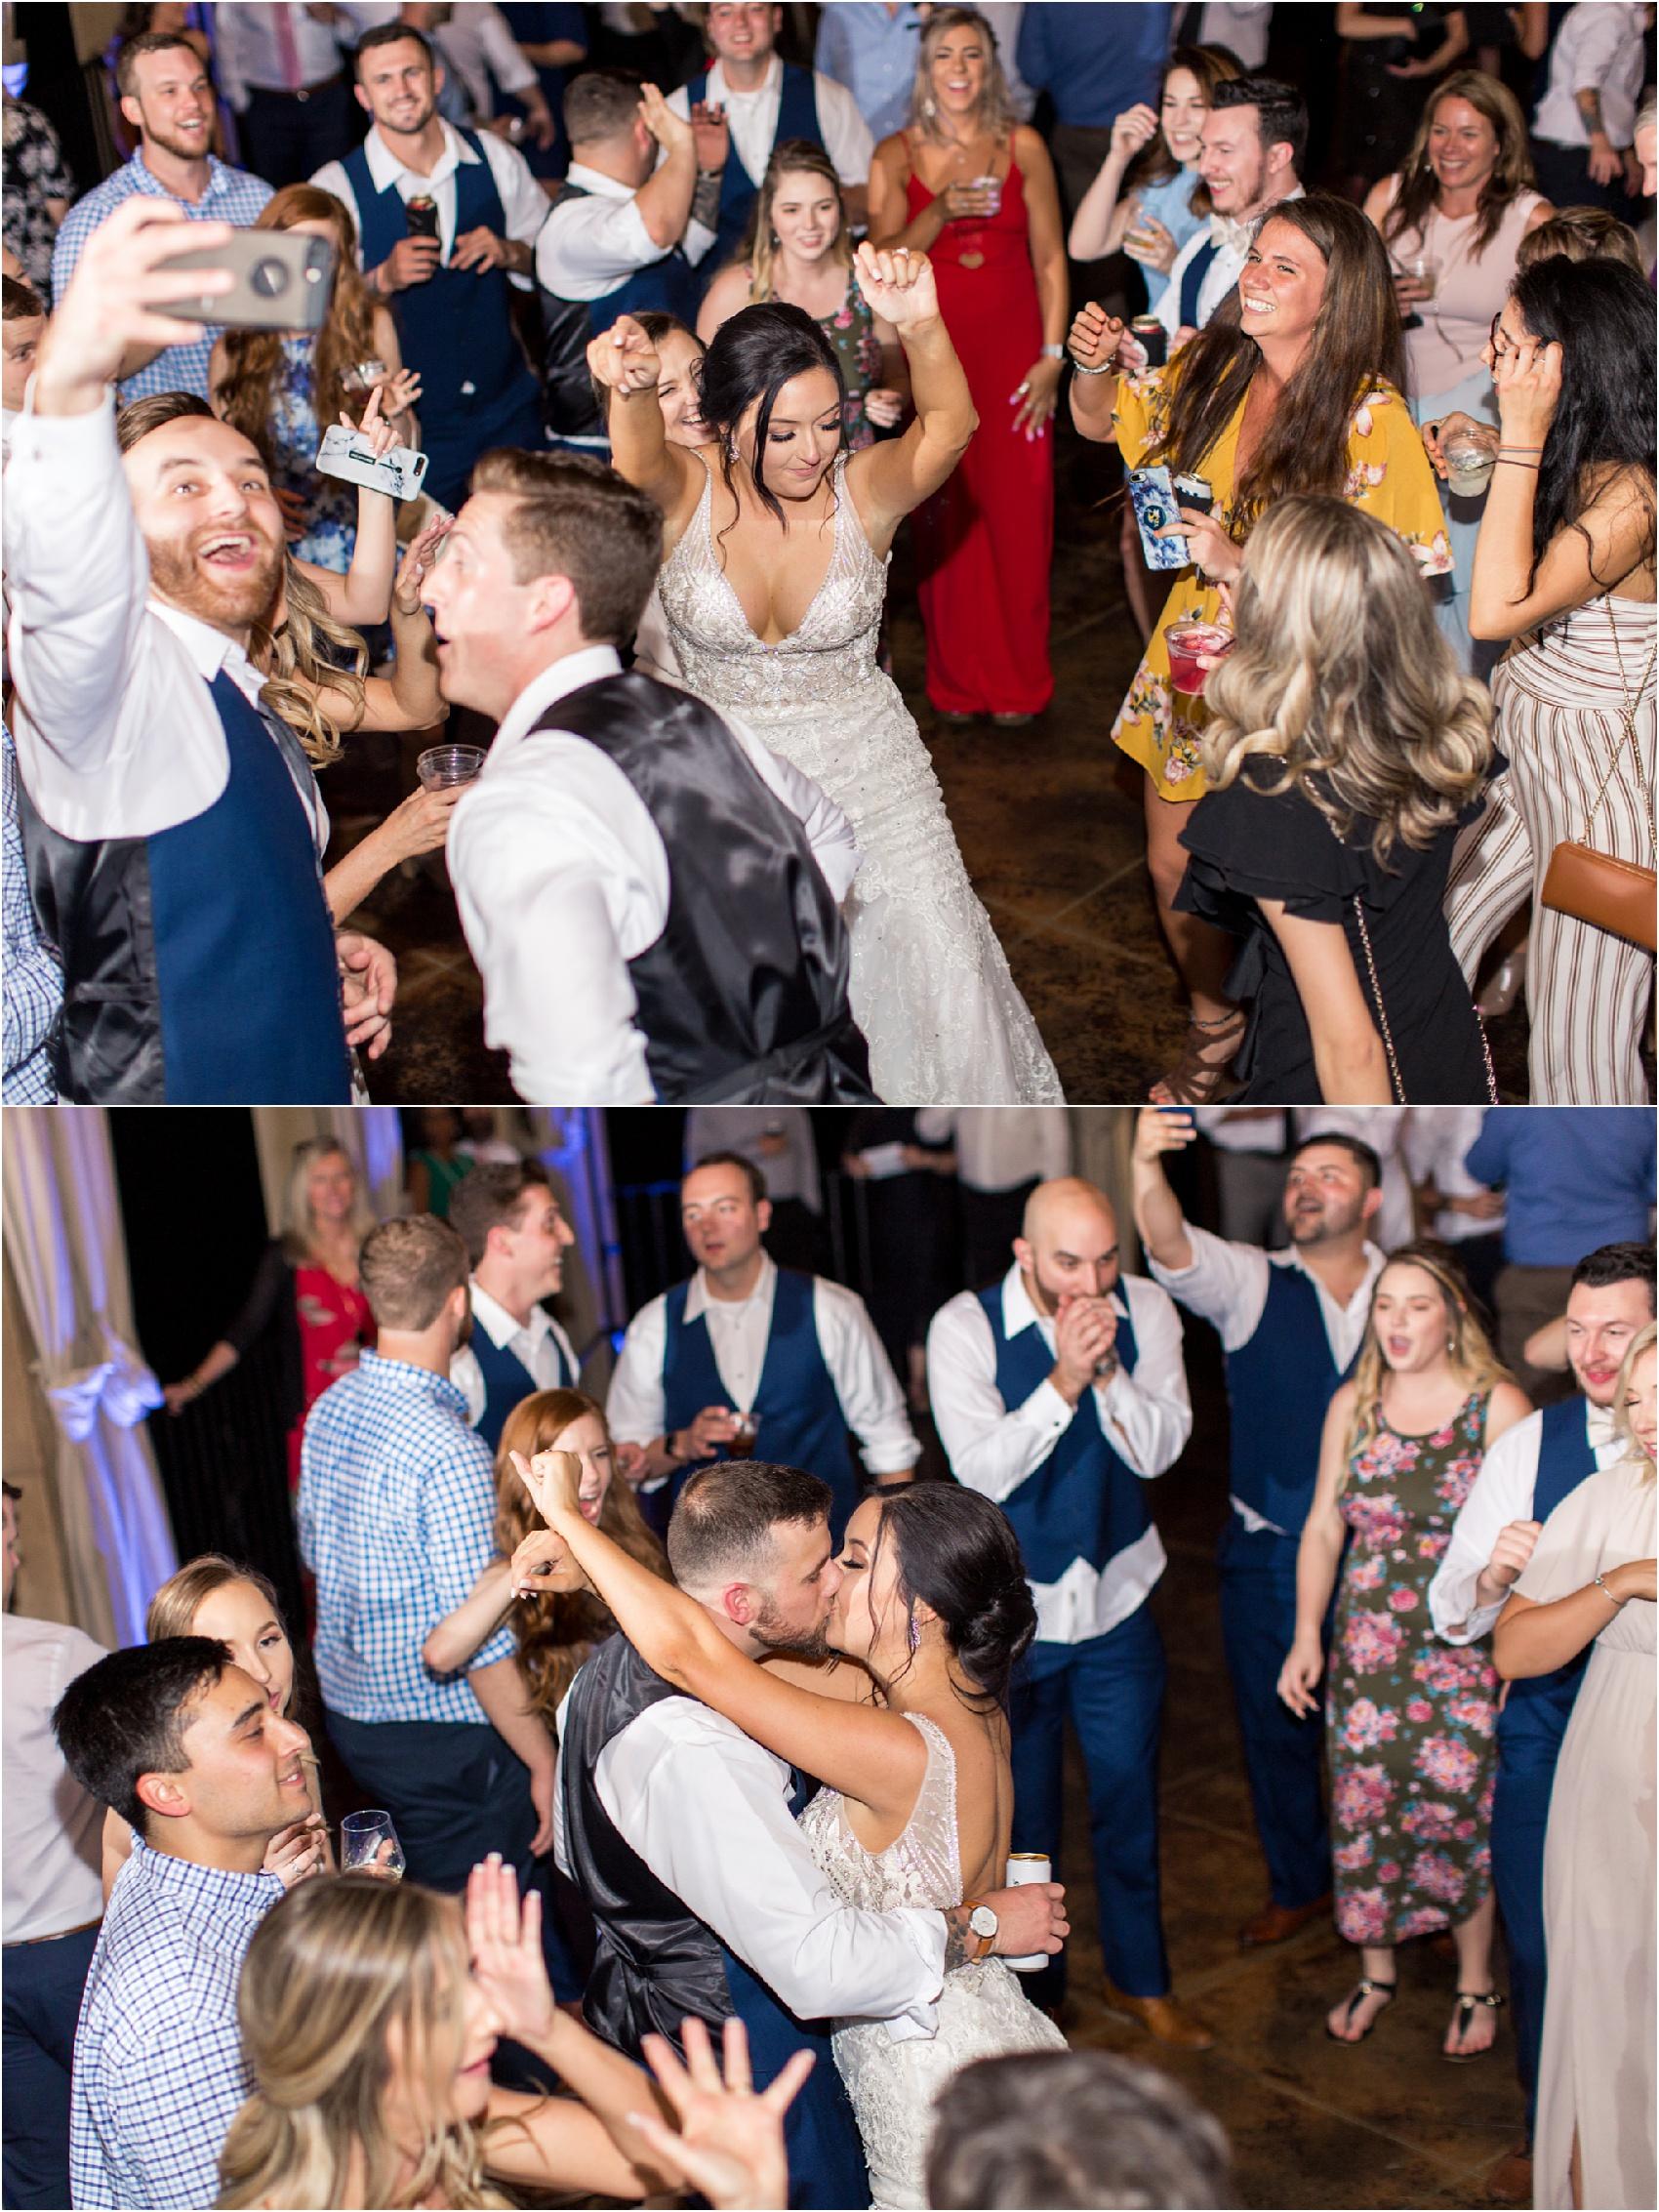 Savannah Eve Photography- Turnbill-Gilgan Wedding- Blog-98.jpg